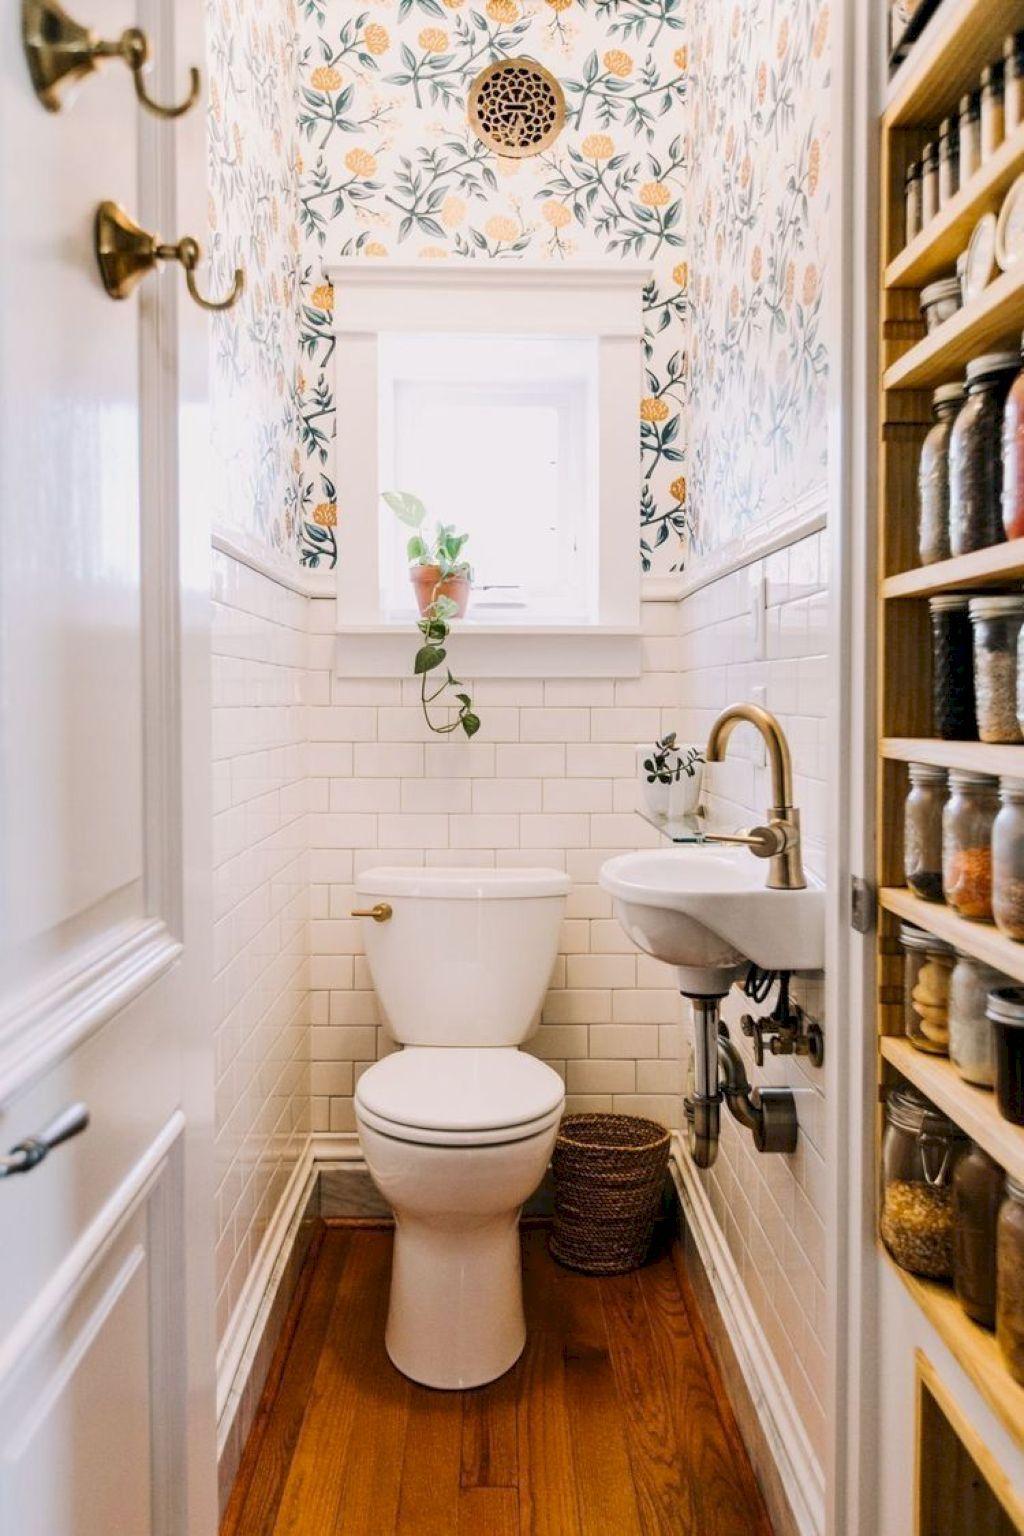 70 best farmhouse bathroom decorating ideas on a budget on amazing small bathroom designs and ideas id=72013